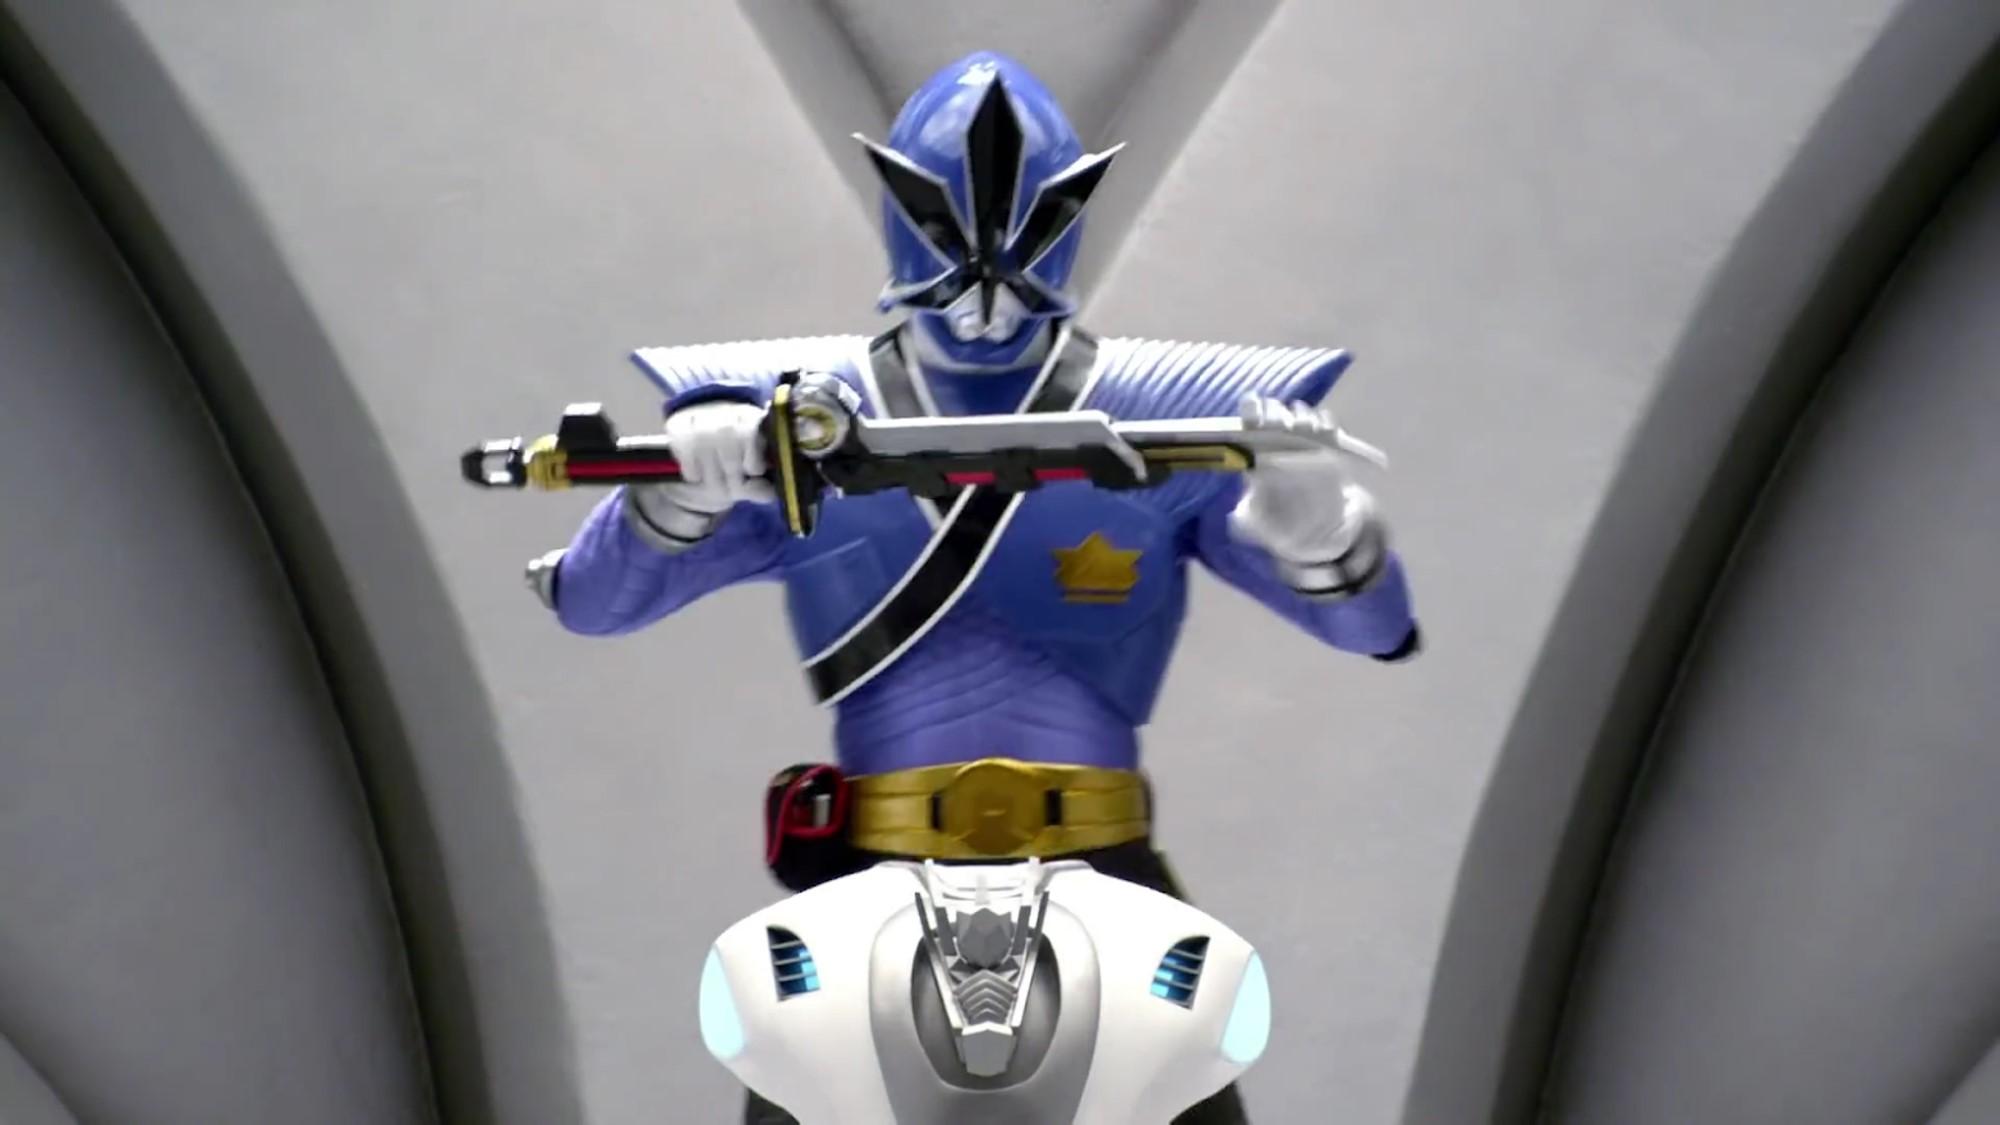 File:Samurai Blue cockpit.jpg